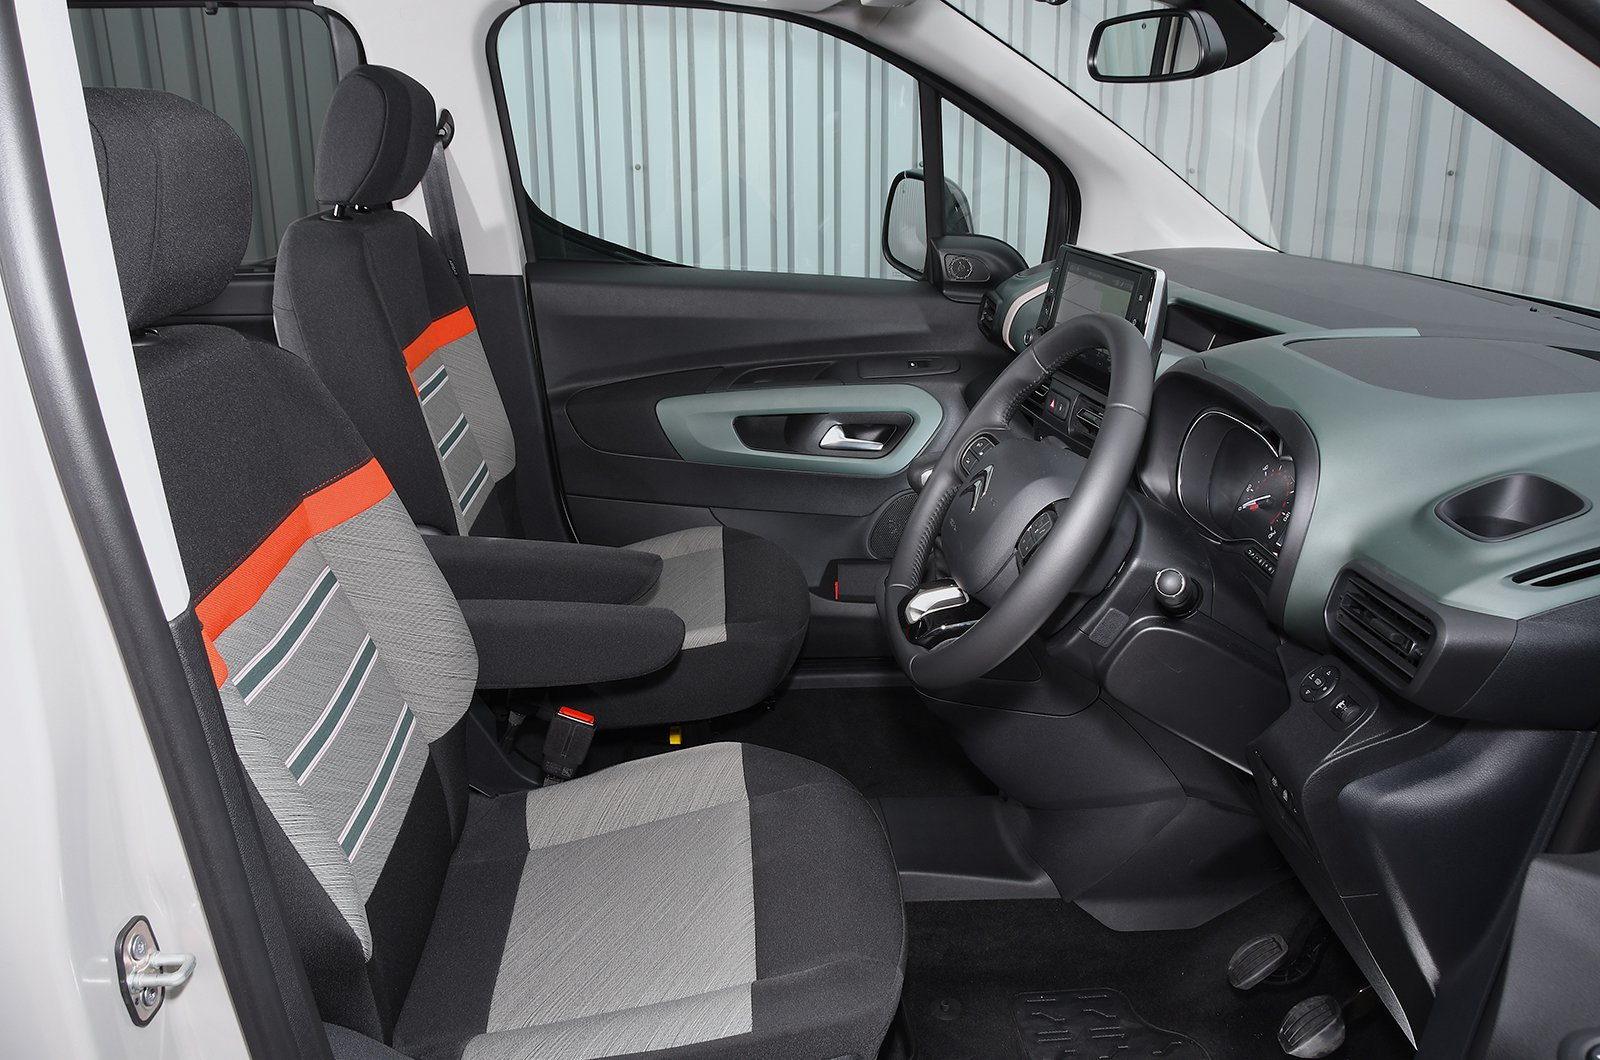 Citroën Berlingo 1.5 BlueHDI 130 Feel M EAT8 - interior